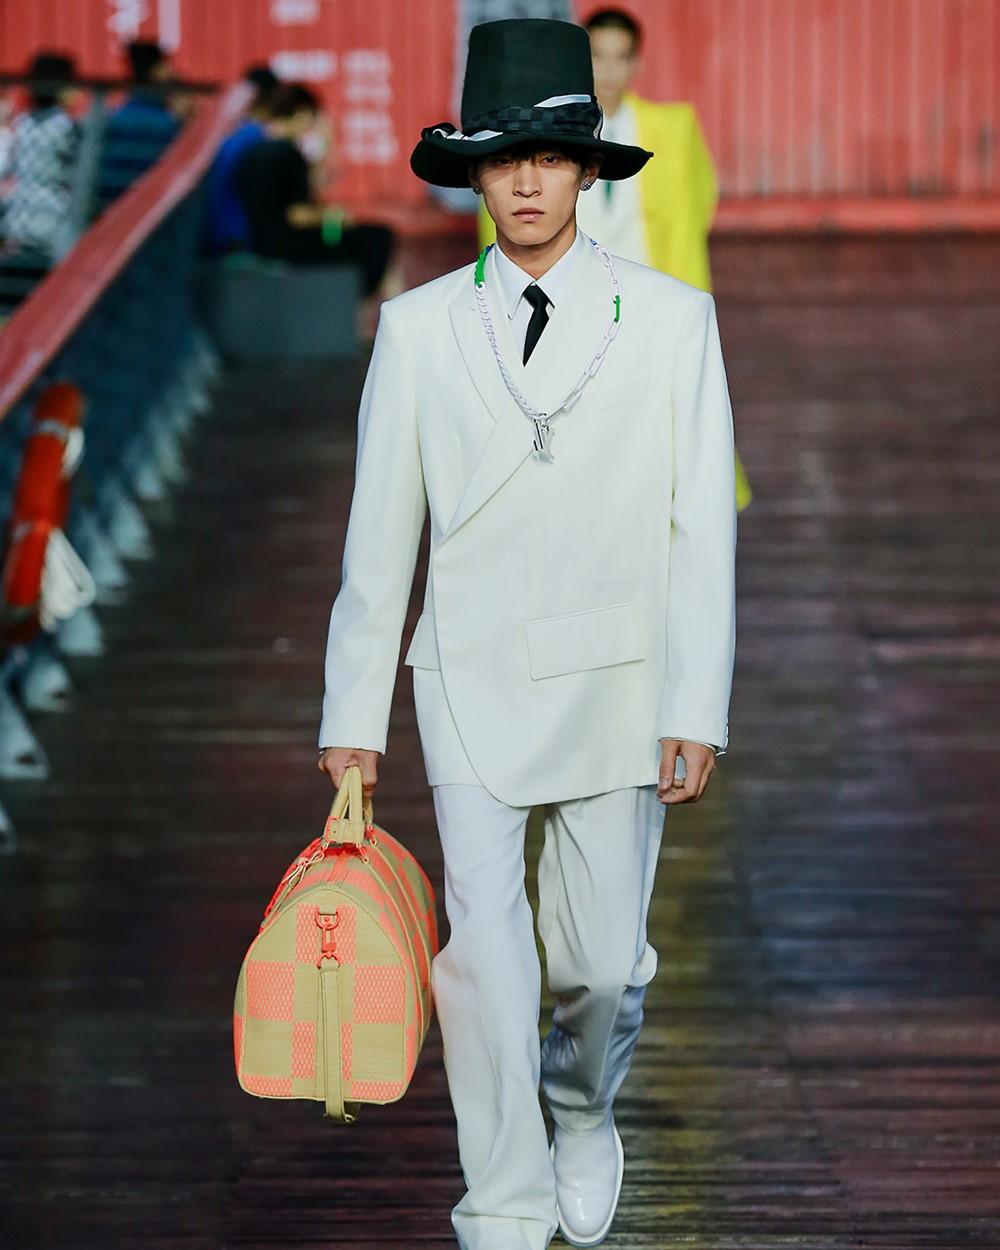 Louis Vuitton Men's Spring Summer 2021Louis Vuitton Men's Spring Summer 2021